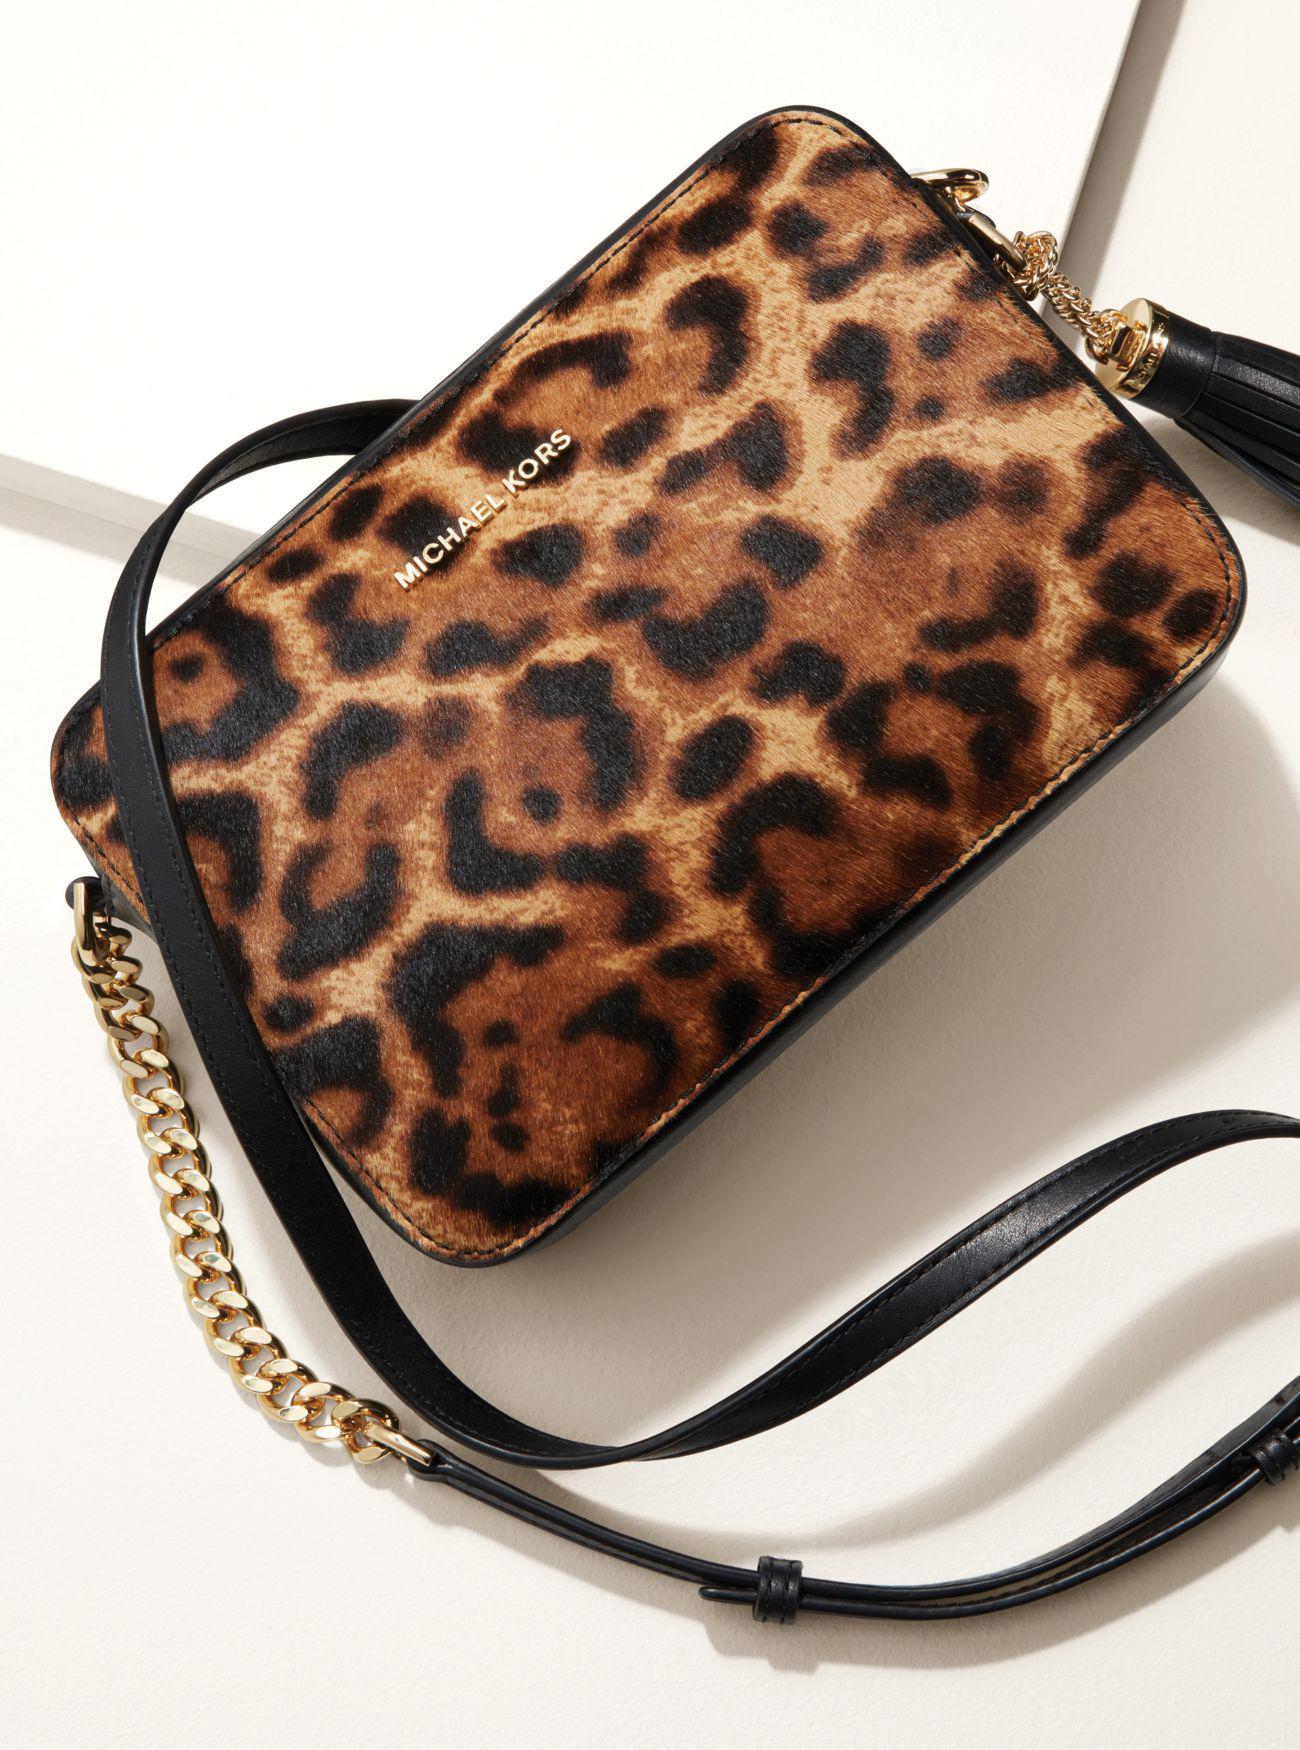 2d14880b47fffa ... coupon michael kors clothing outlet skorpios textured leather handbags  purses wallets dillards lyst michael kors jet